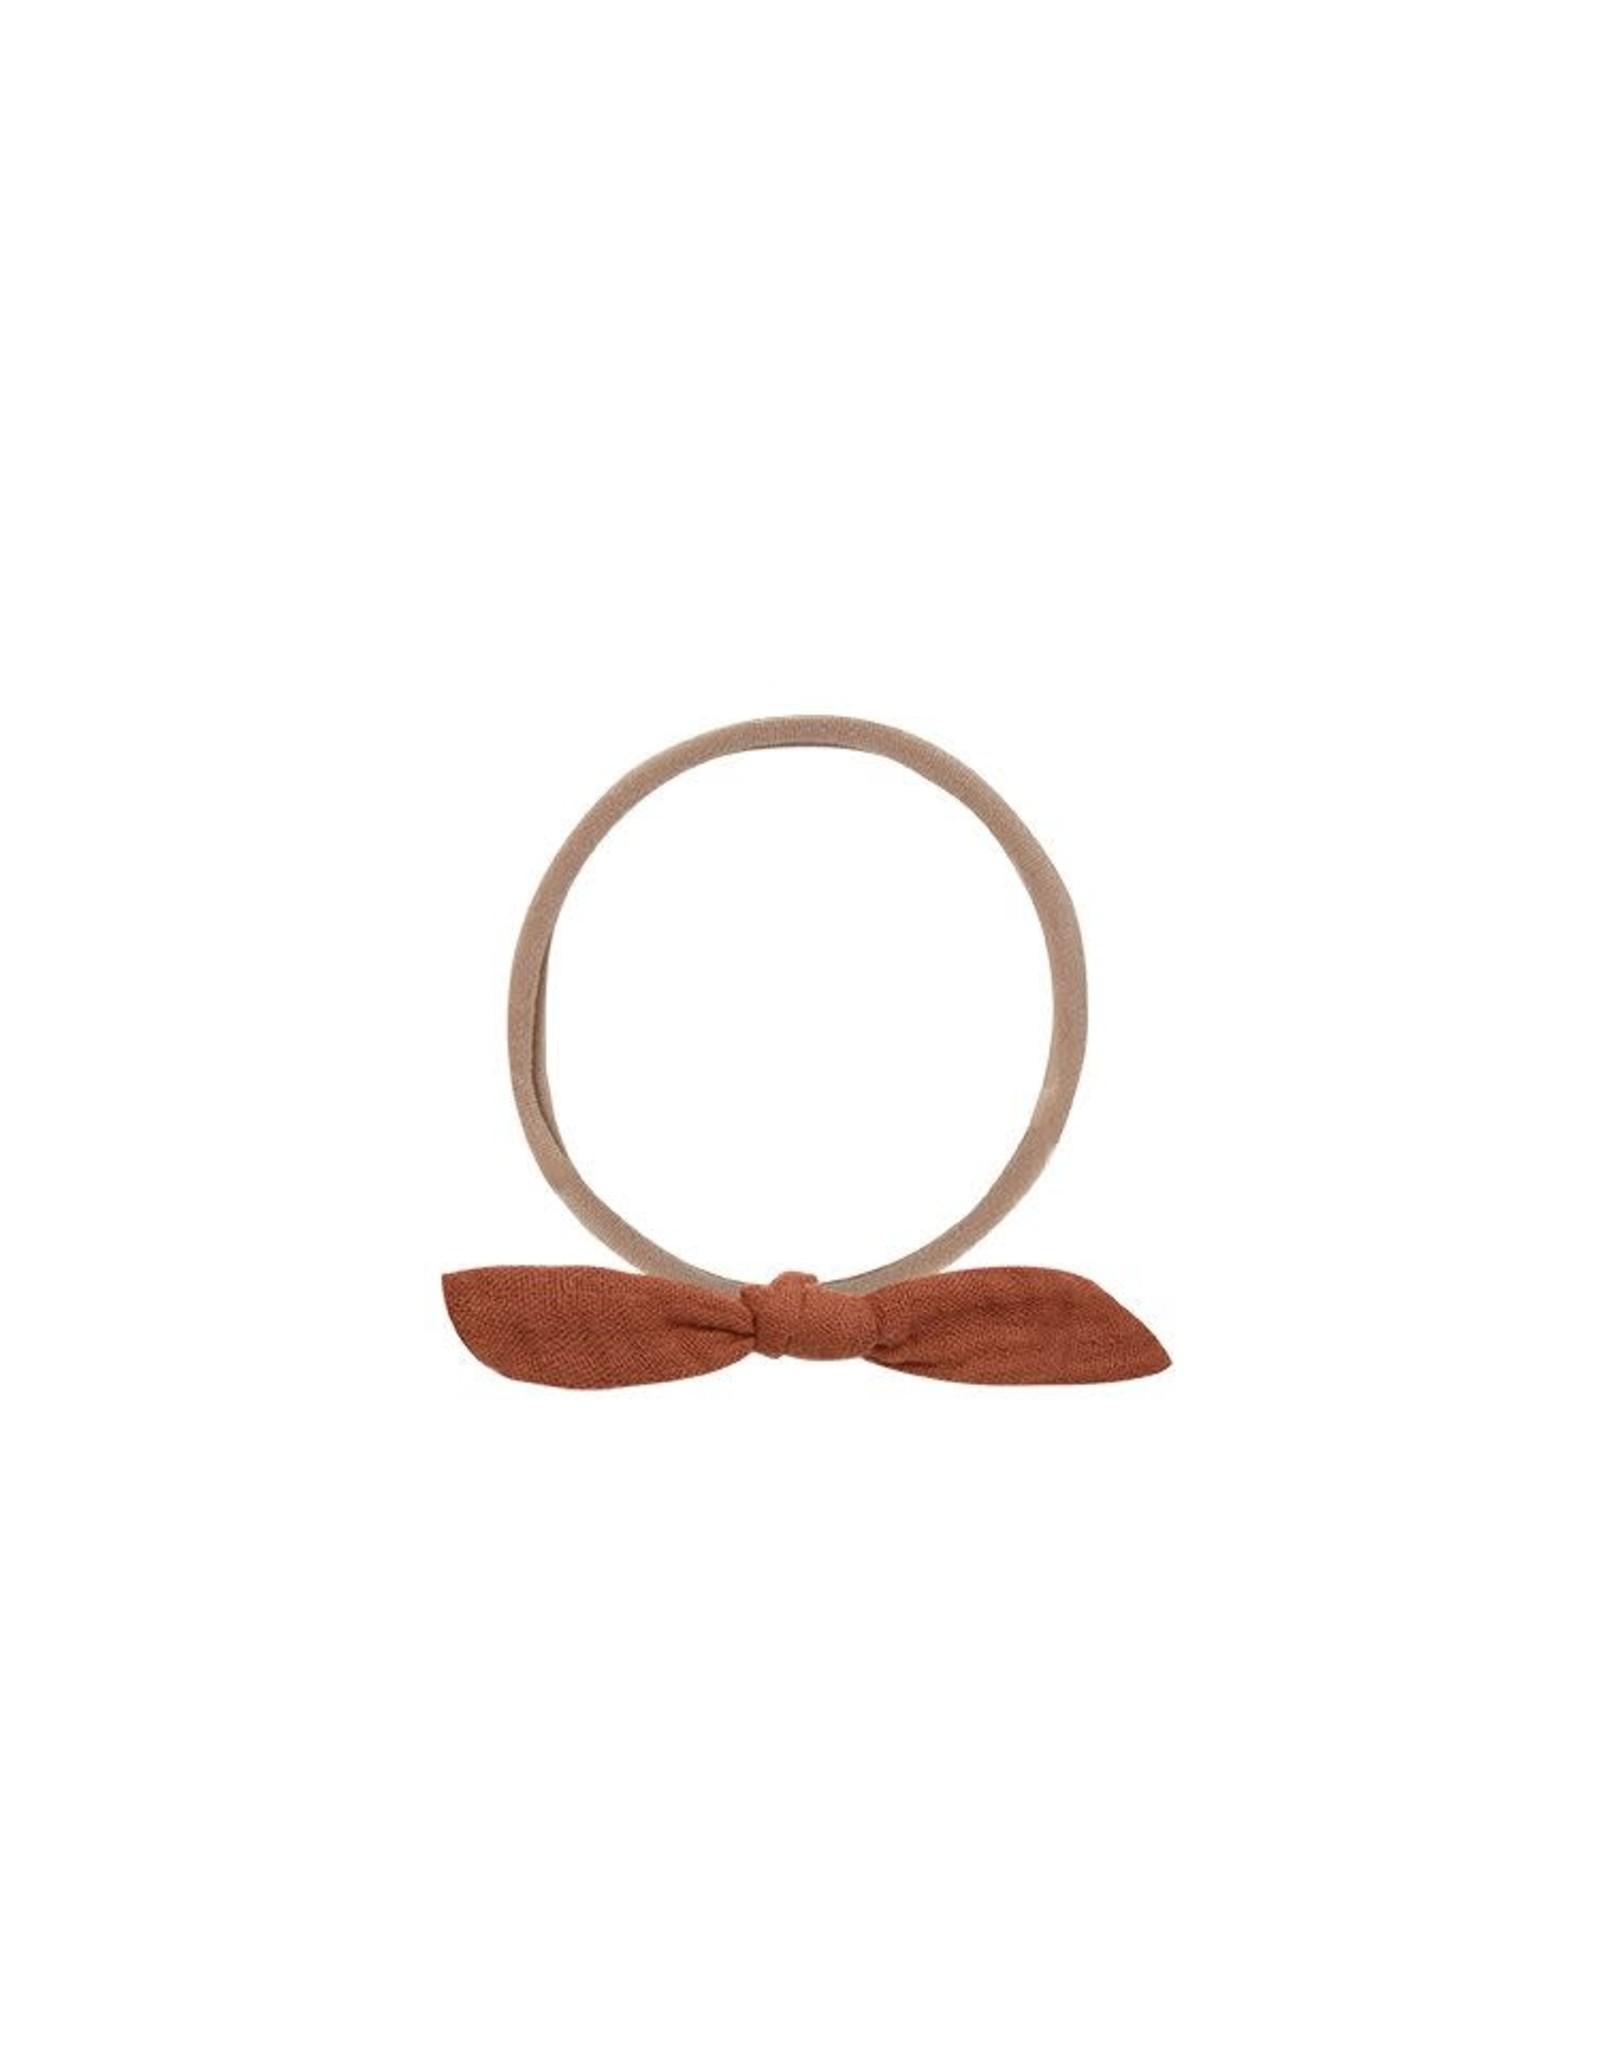 Rylee and Cru knot headband- amber